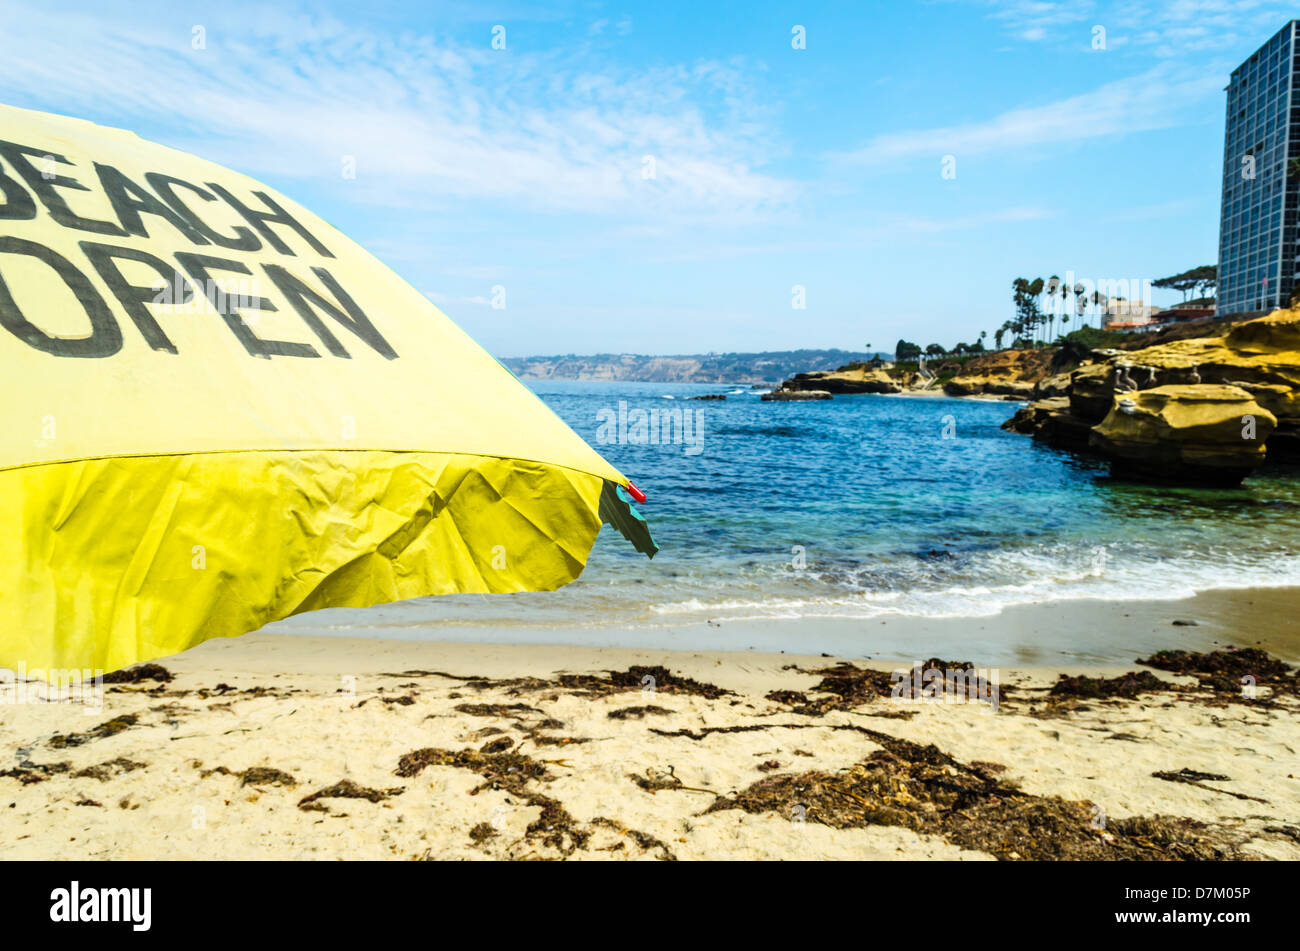 Children's Pool Beach. La Jolla, CA, USA. Beach Open sign written on a beach umbrella. - Stock Image